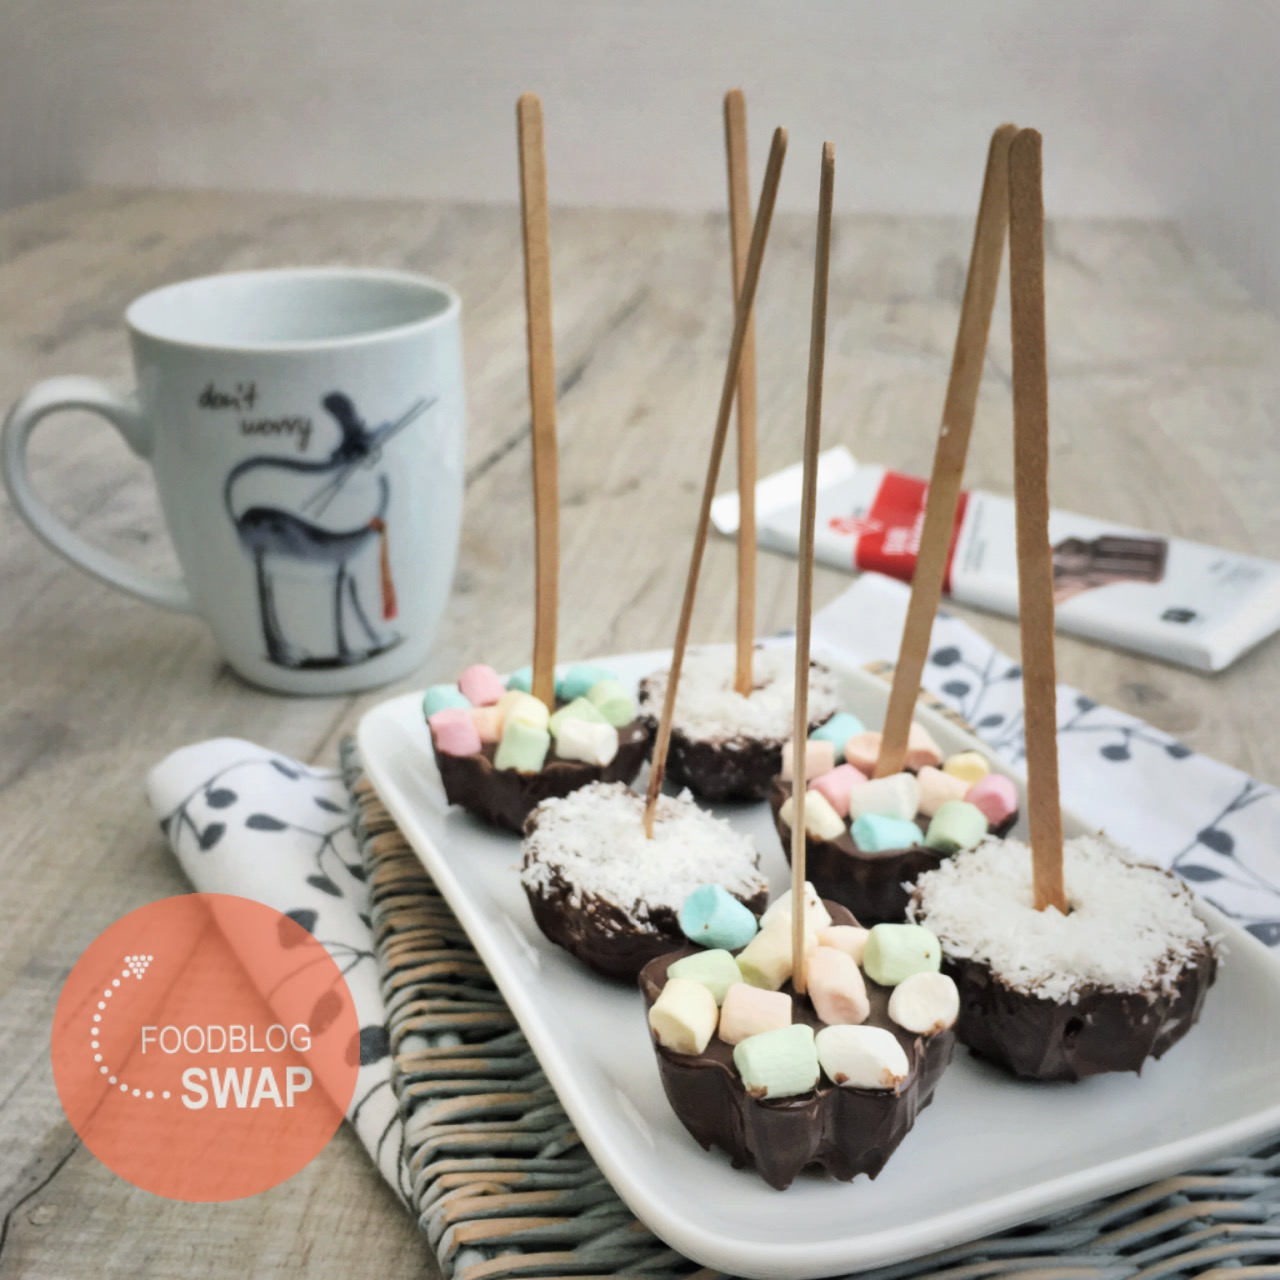 Chocolade lepels voor warme chocolade melk